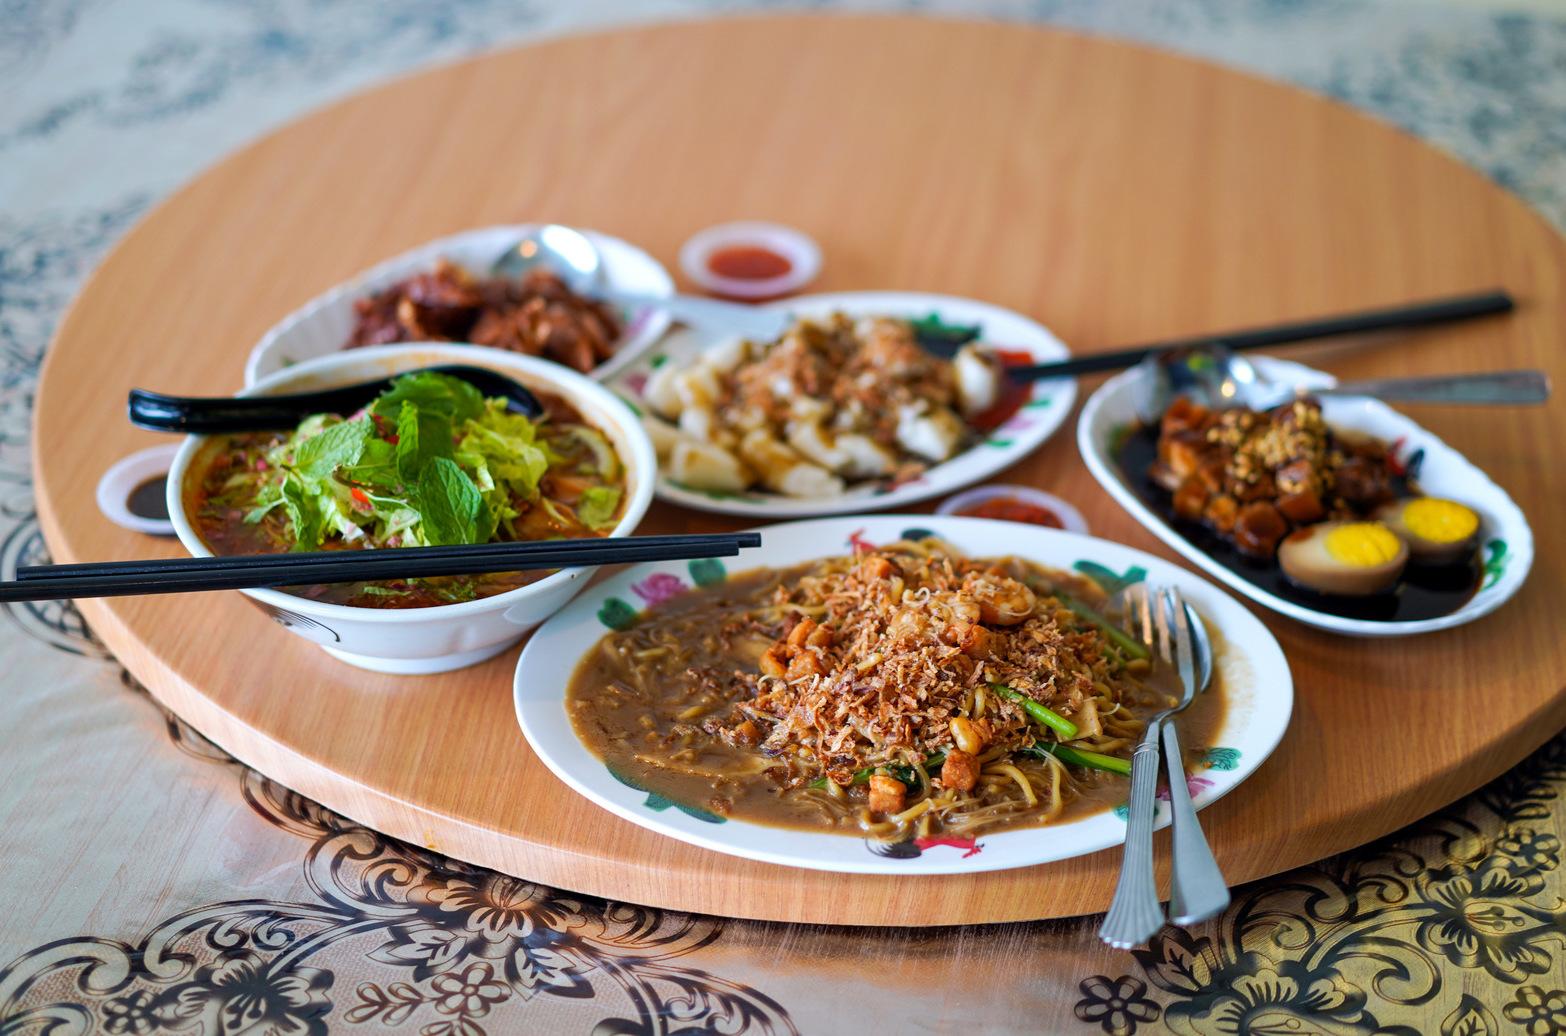 Ai Jiak Penang Food, Petaling Jaya